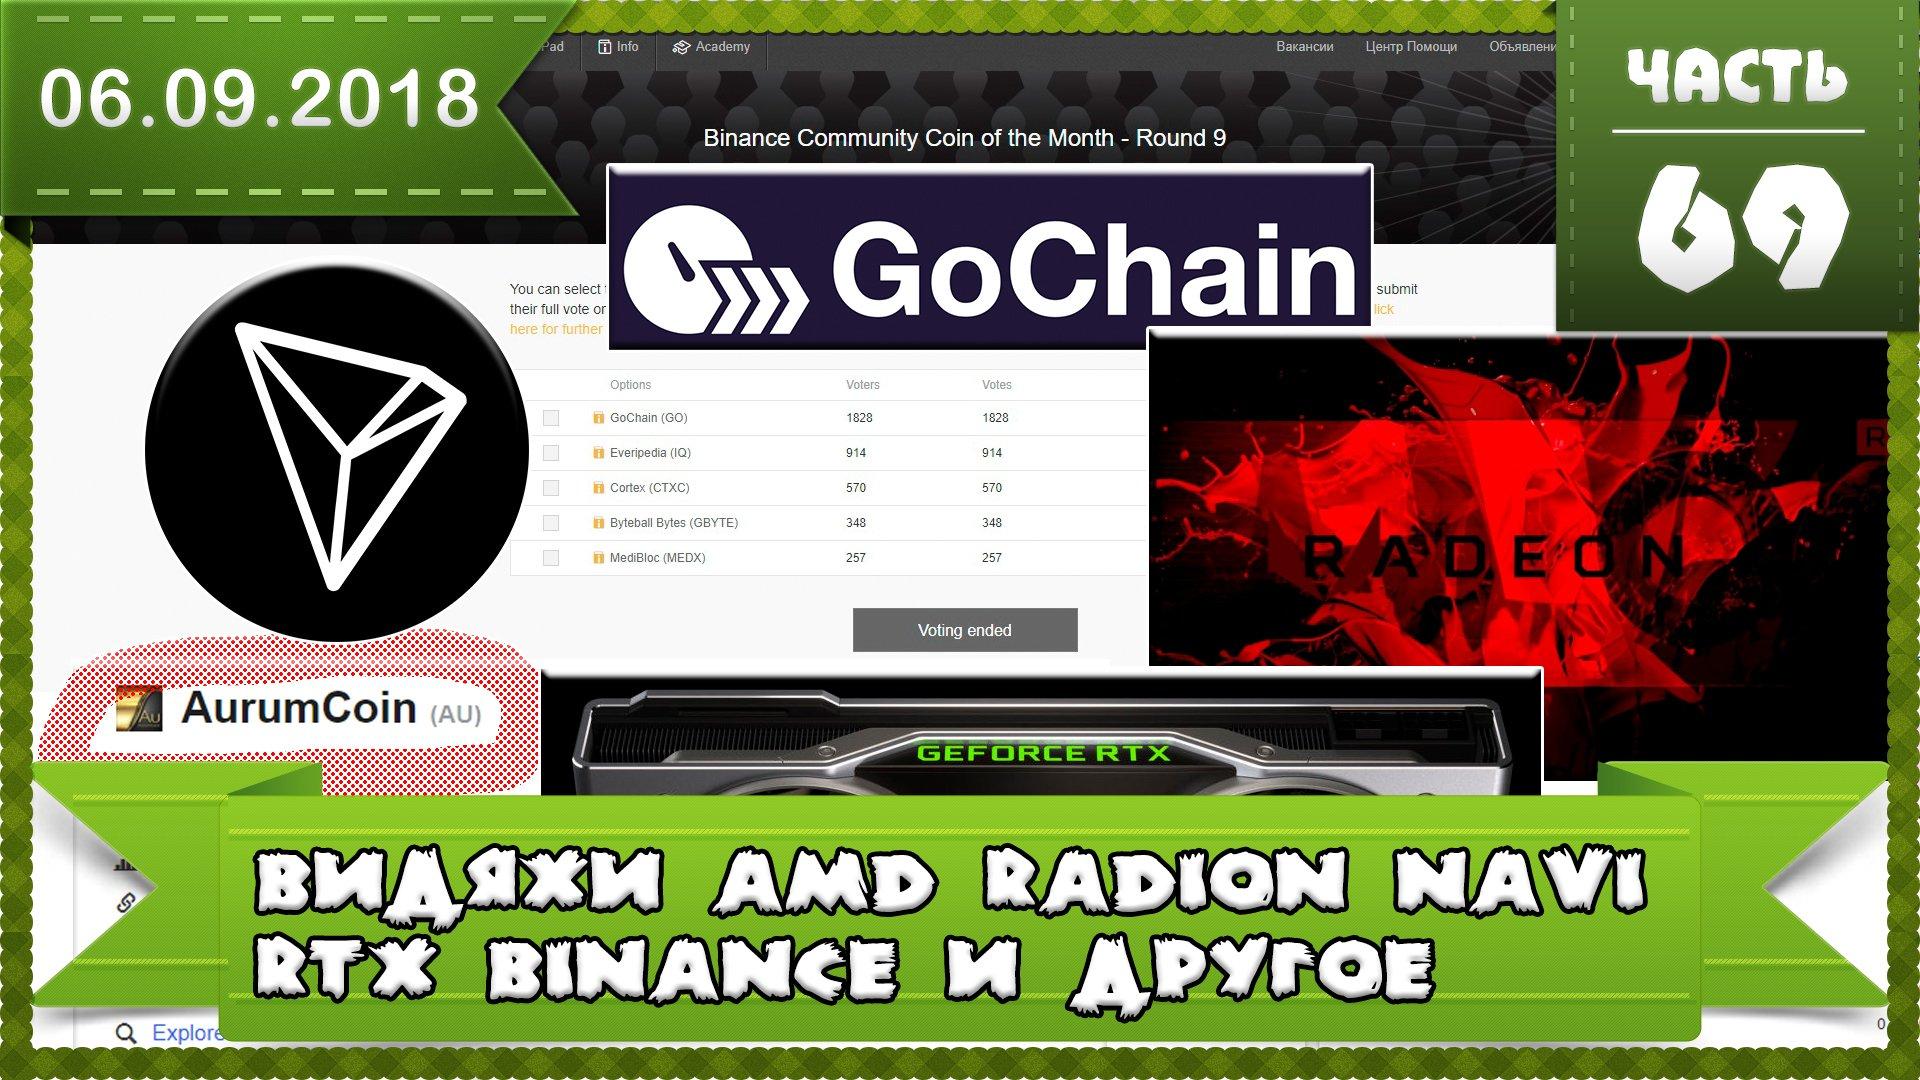 Видеокарты от AMD Radeon NAVI на 7-нм чипе даты RTX, победитель 9 Раунда Бинанс, конкурс на 1мил TRX